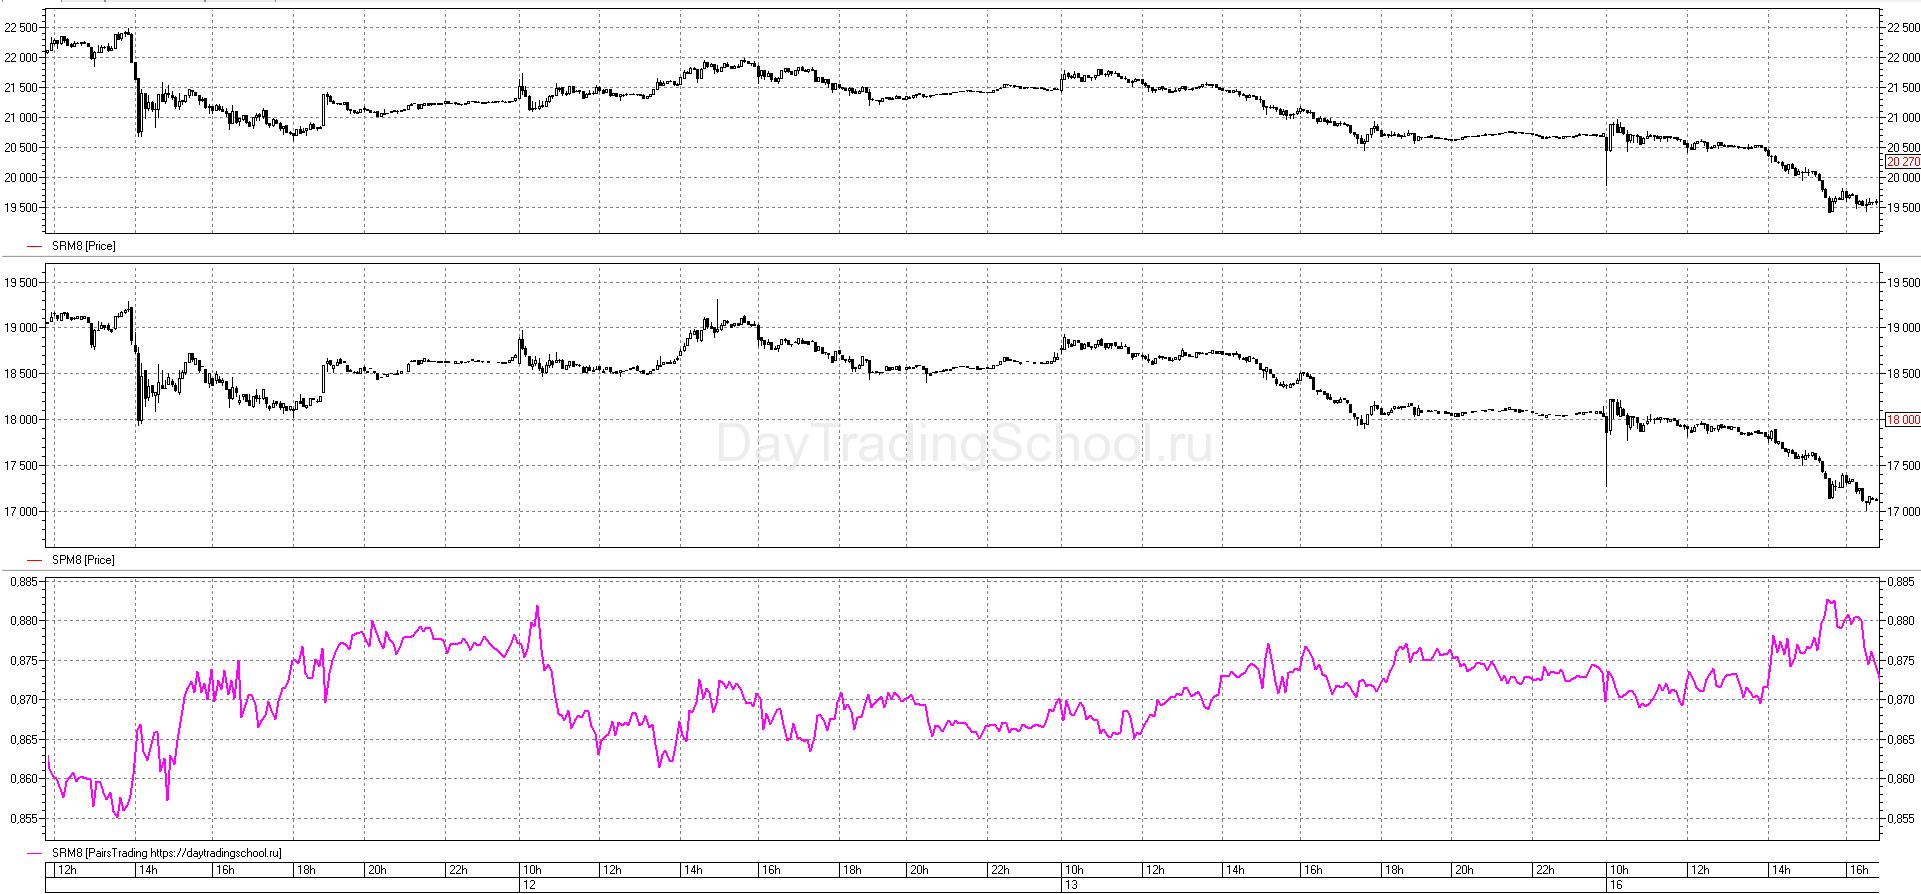 график-Отношение-Pairs-Tradings